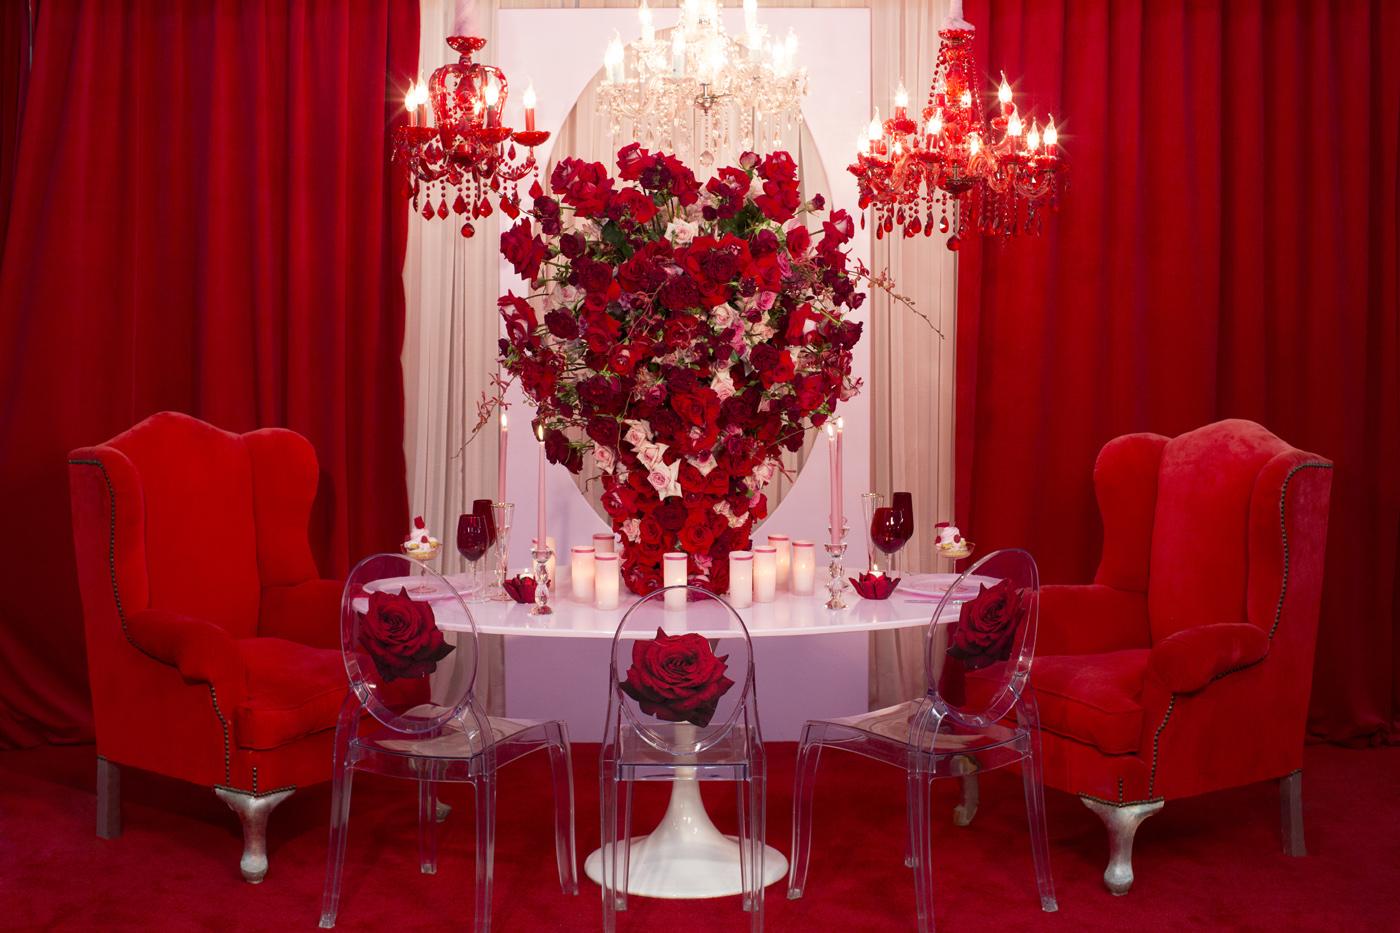 001_DukePhotography_DukeImages_Editorial_Valentines.jpg